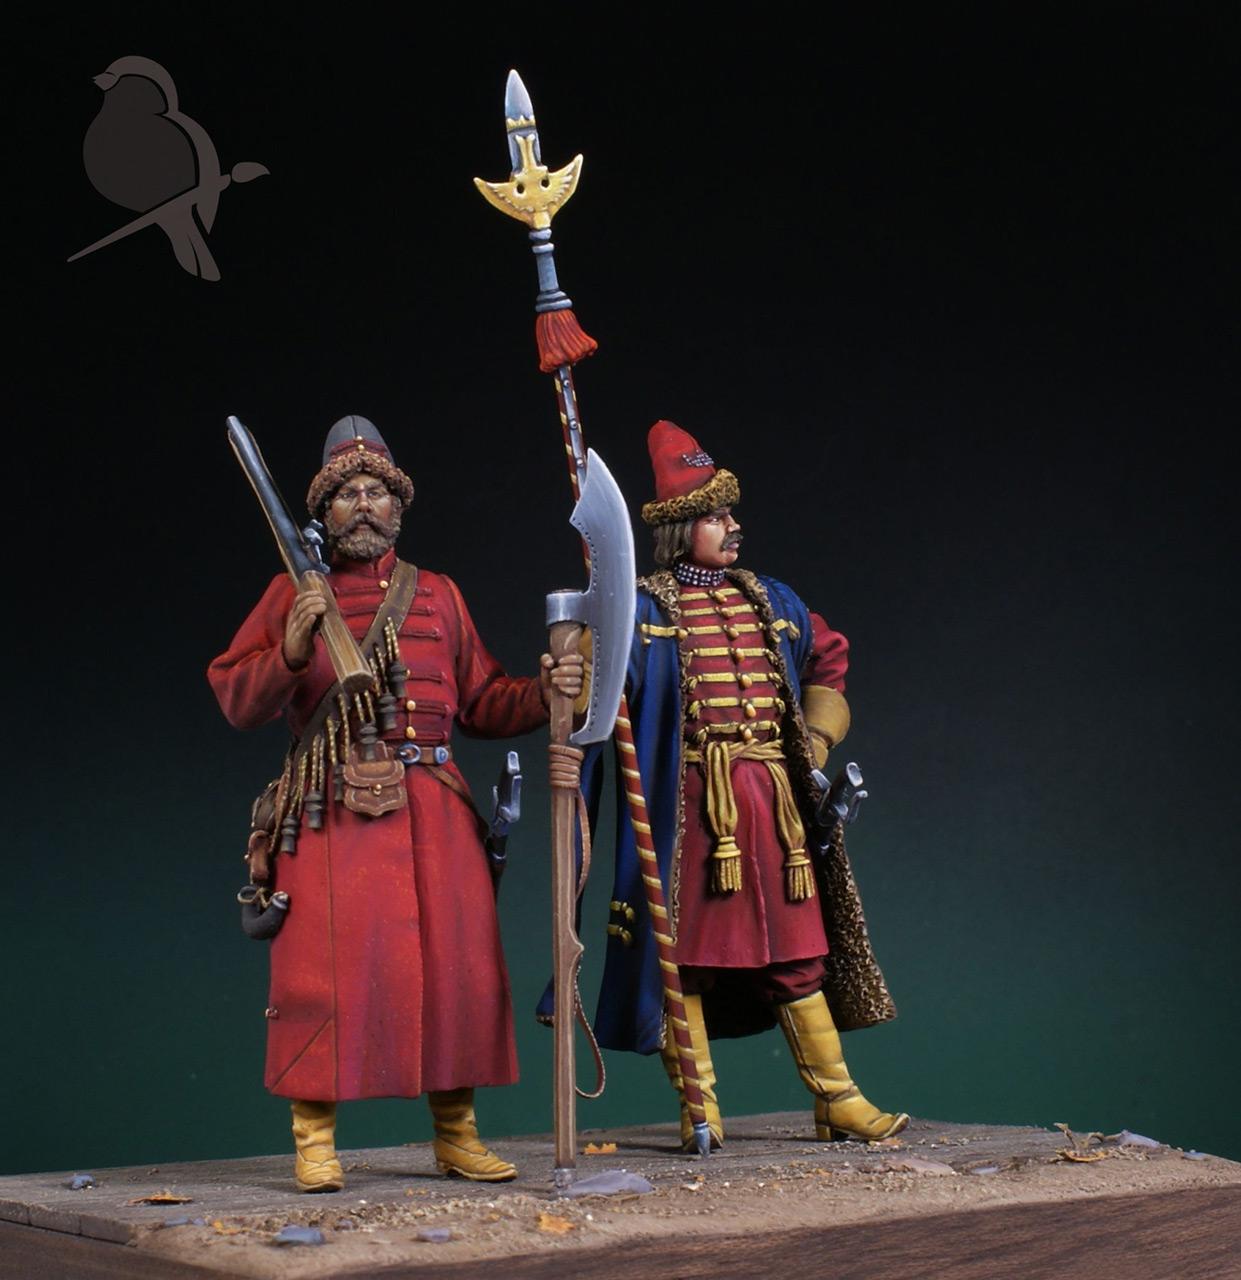 Dioramas and Vignettes: Strelets and Sotnik, 5th Prikaz, photo #7